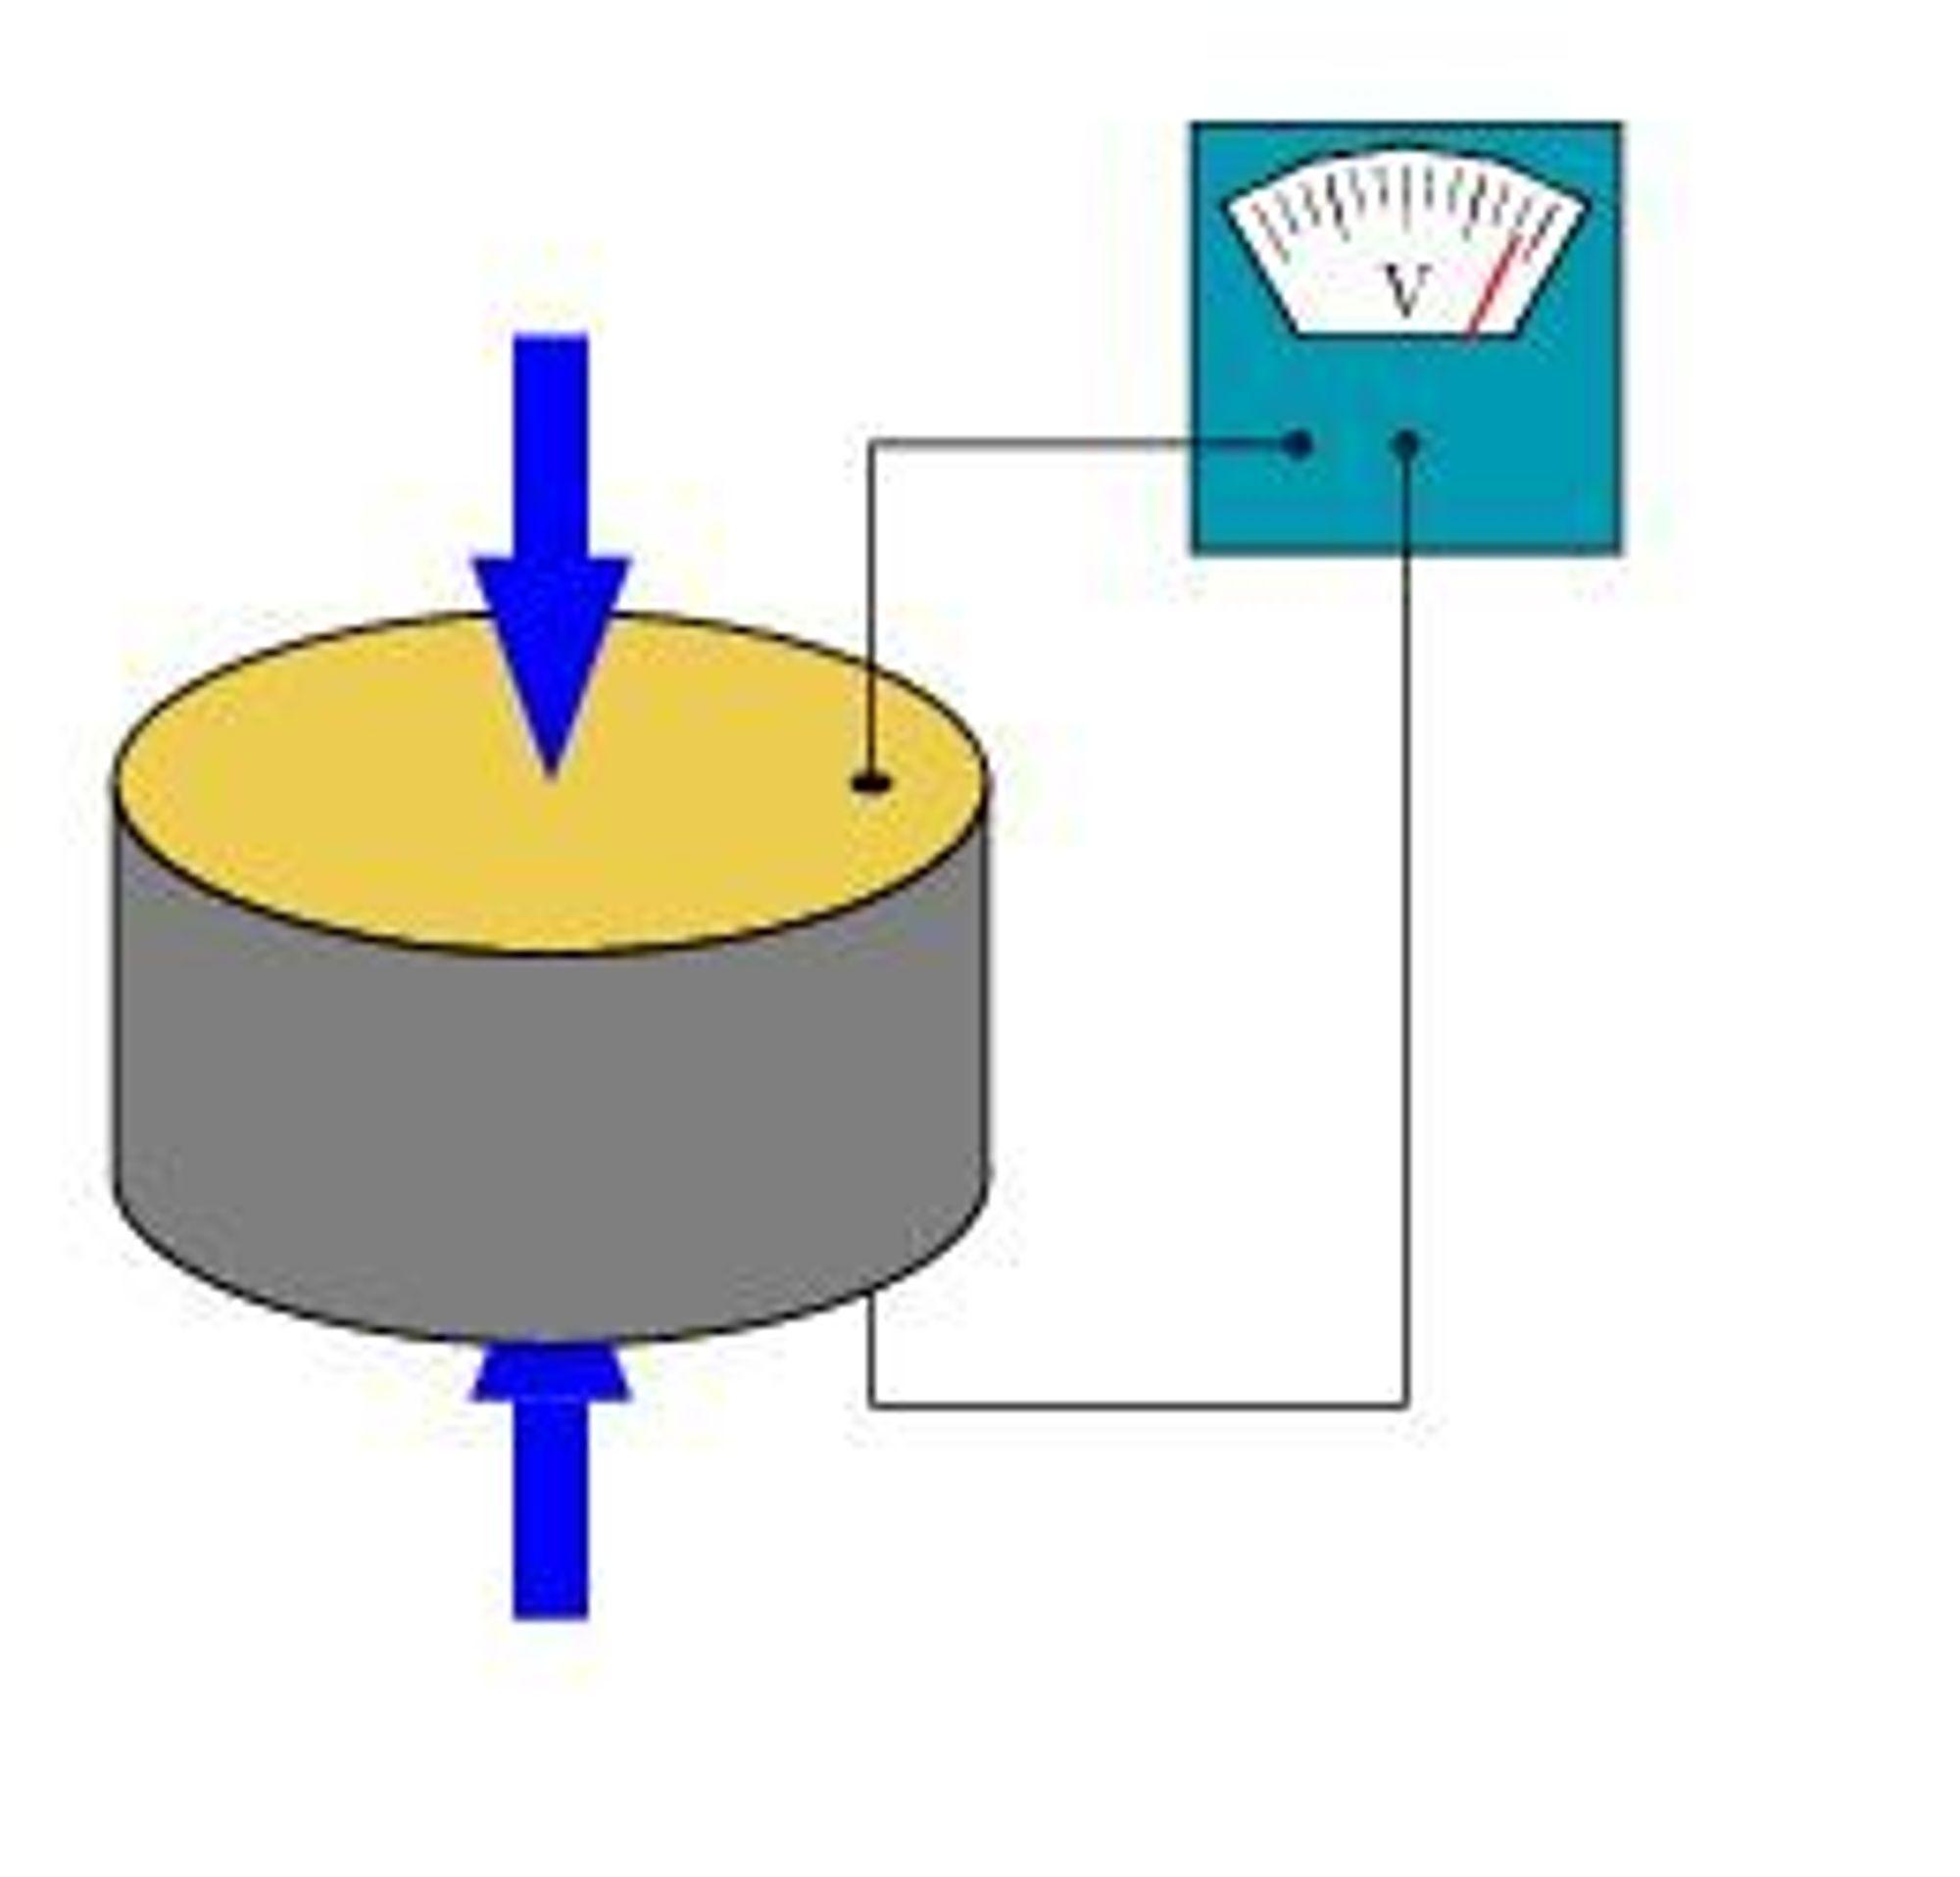 Når piezoelektriske materialer trykkes sammen, genereres en spenning.